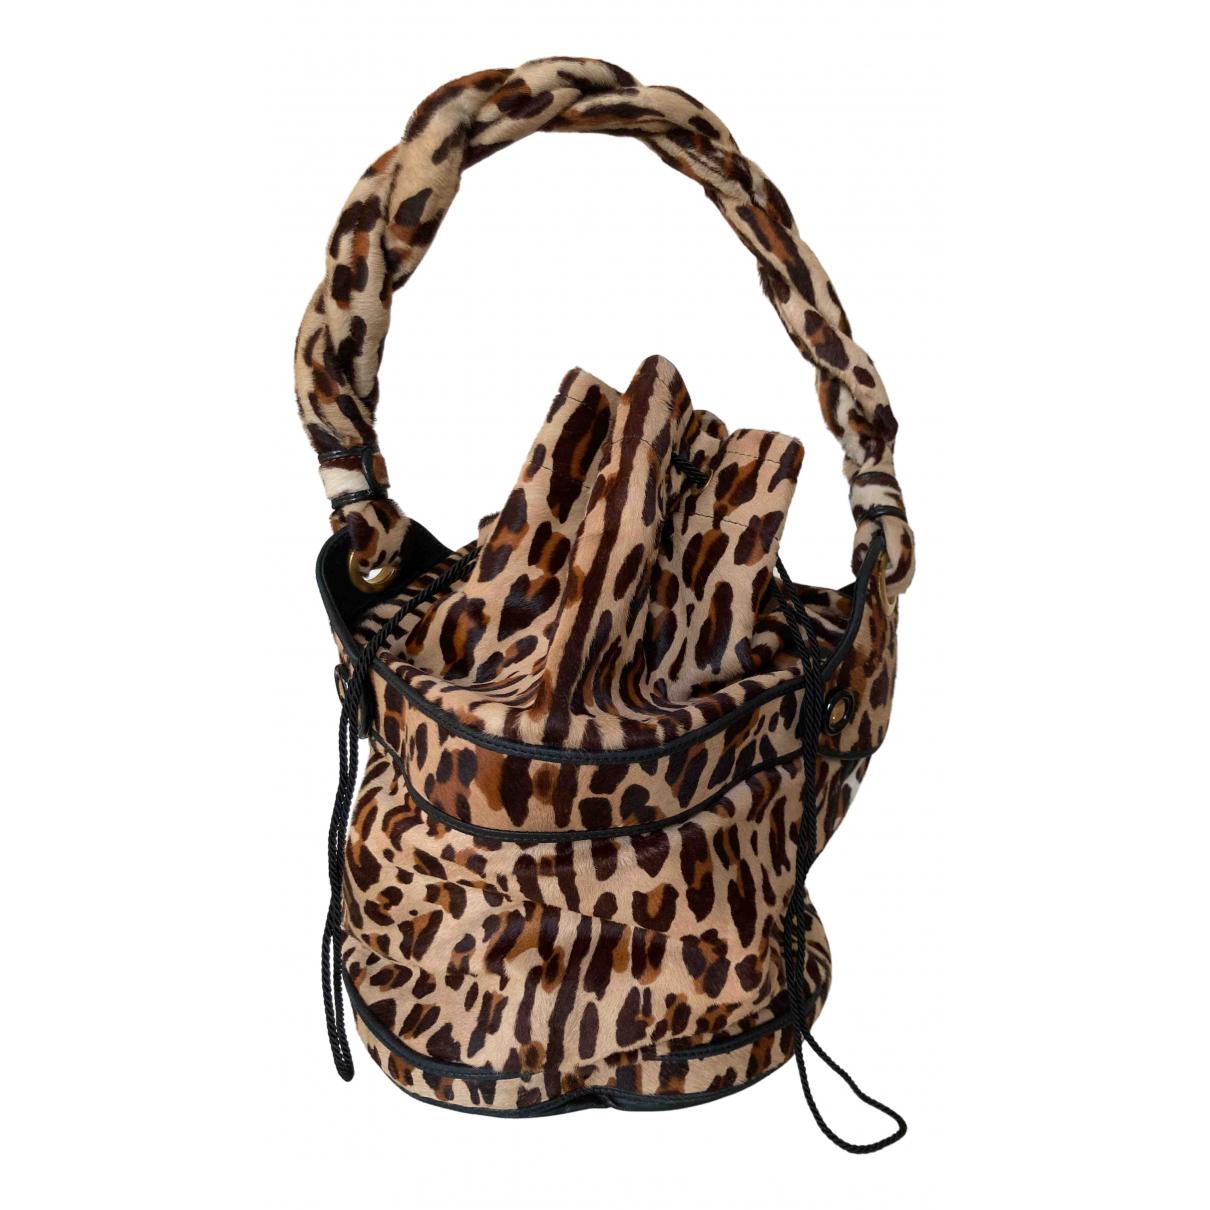 Fendi Palazzo Bucket Brown Pony-style calfskin handbag for Women \N